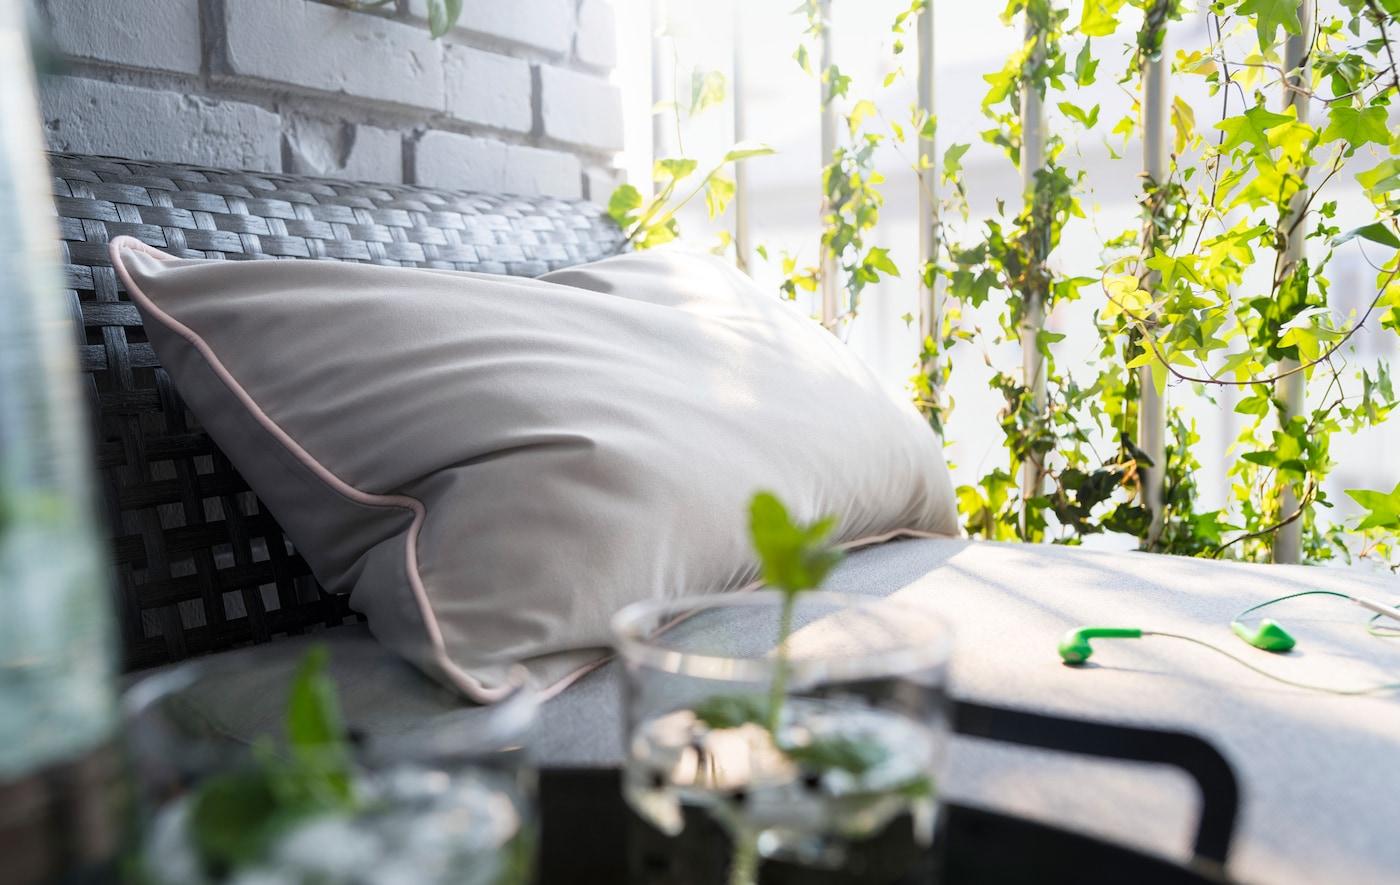 balkon mit pflanzen gestalten tipps ikea ikea. Black Bedroom Furniture Sets. Home Design Ideas